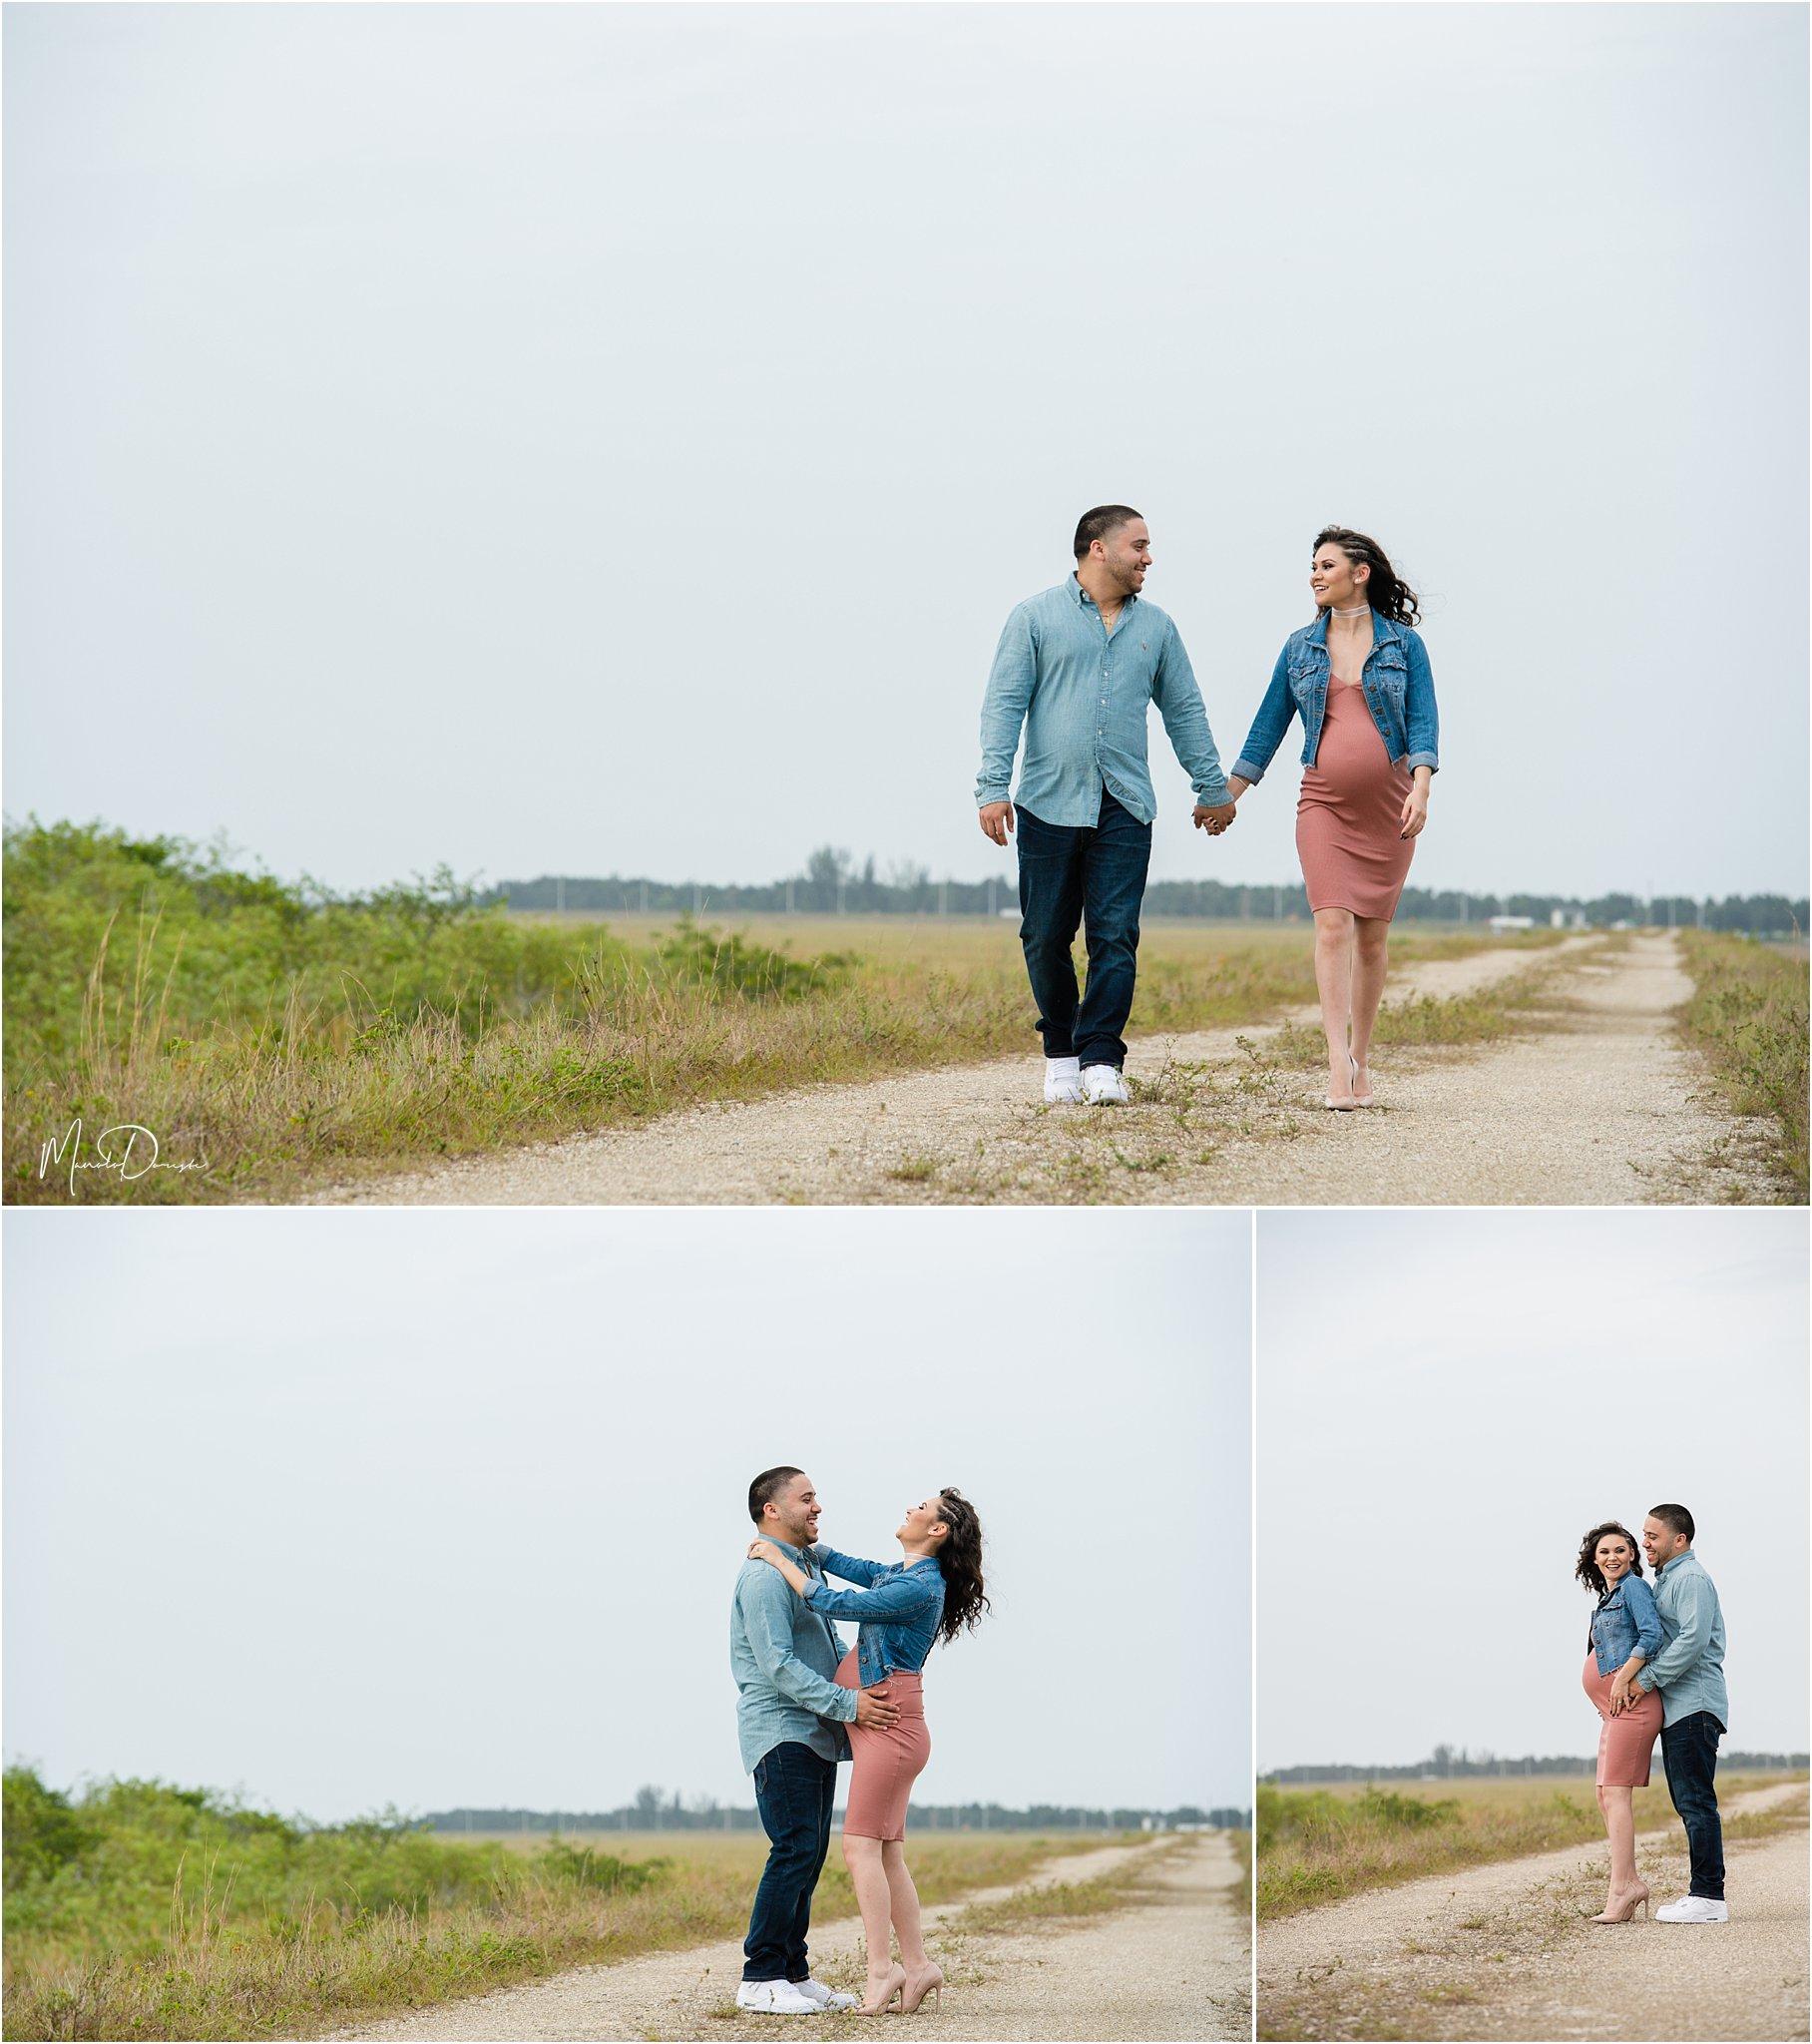 0399_ManoloDoreste_InFocusStudios_Wedding_Family_Photography_Miami_MiamiPhotographer.jpg